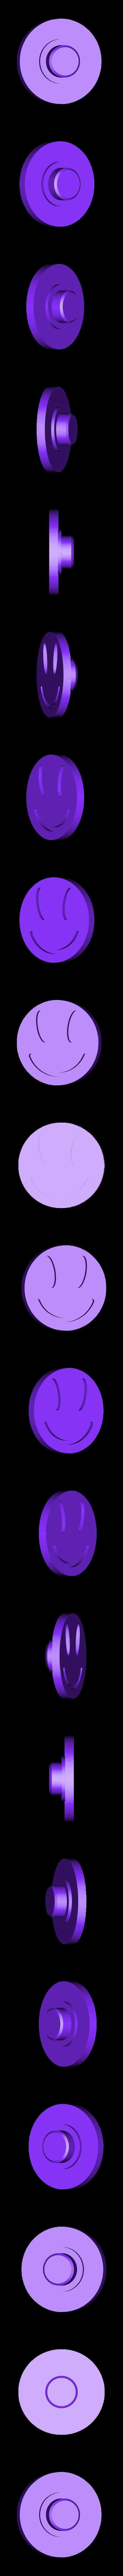 smiley 3.stl Download free STL file HAND SPINNER EVOLUTION • Object to 3D print, DJER